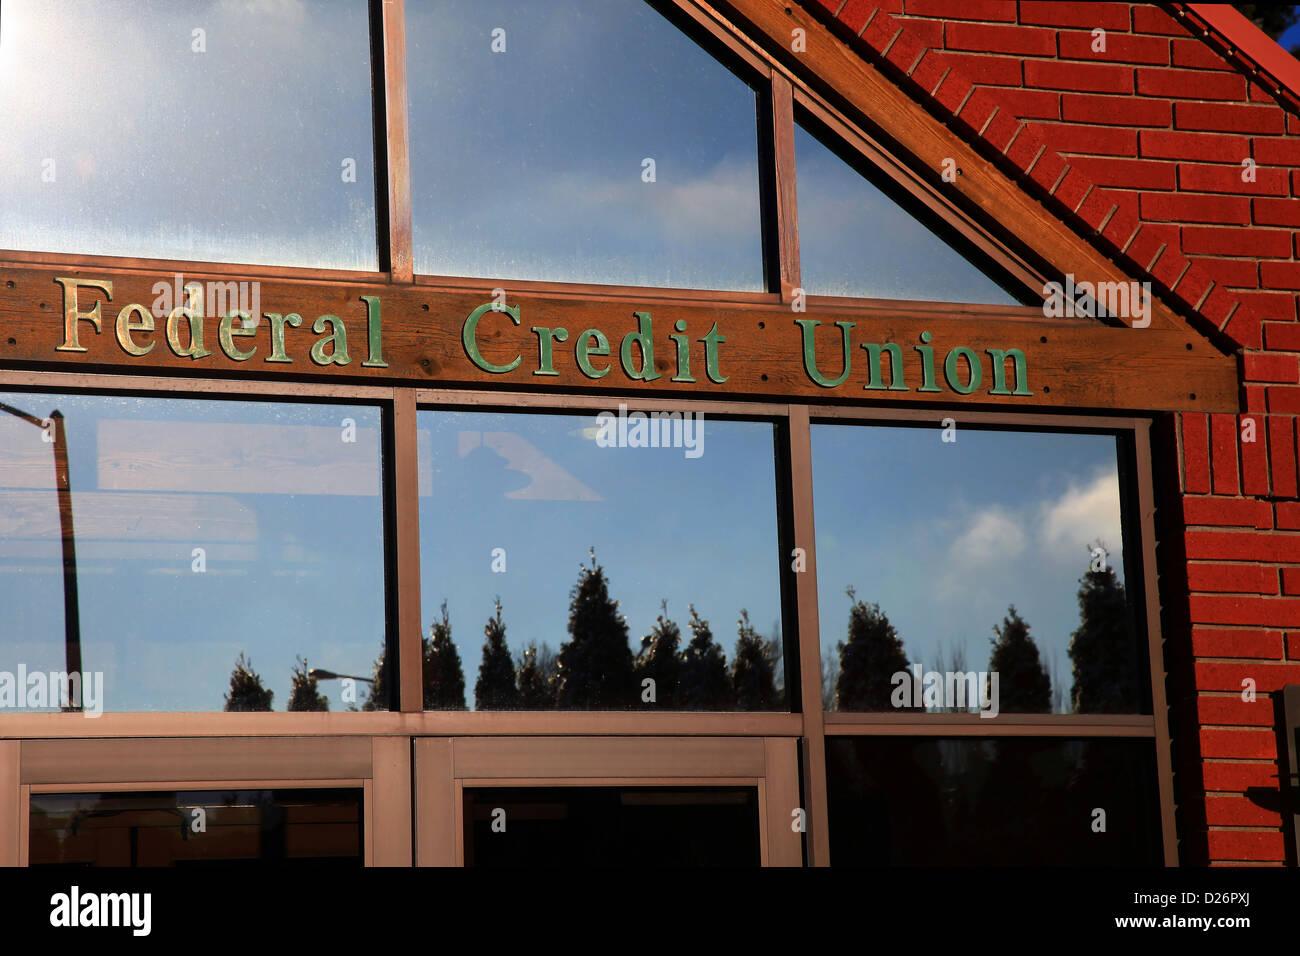 Generic Federal Credit Union sign Immagini Stock